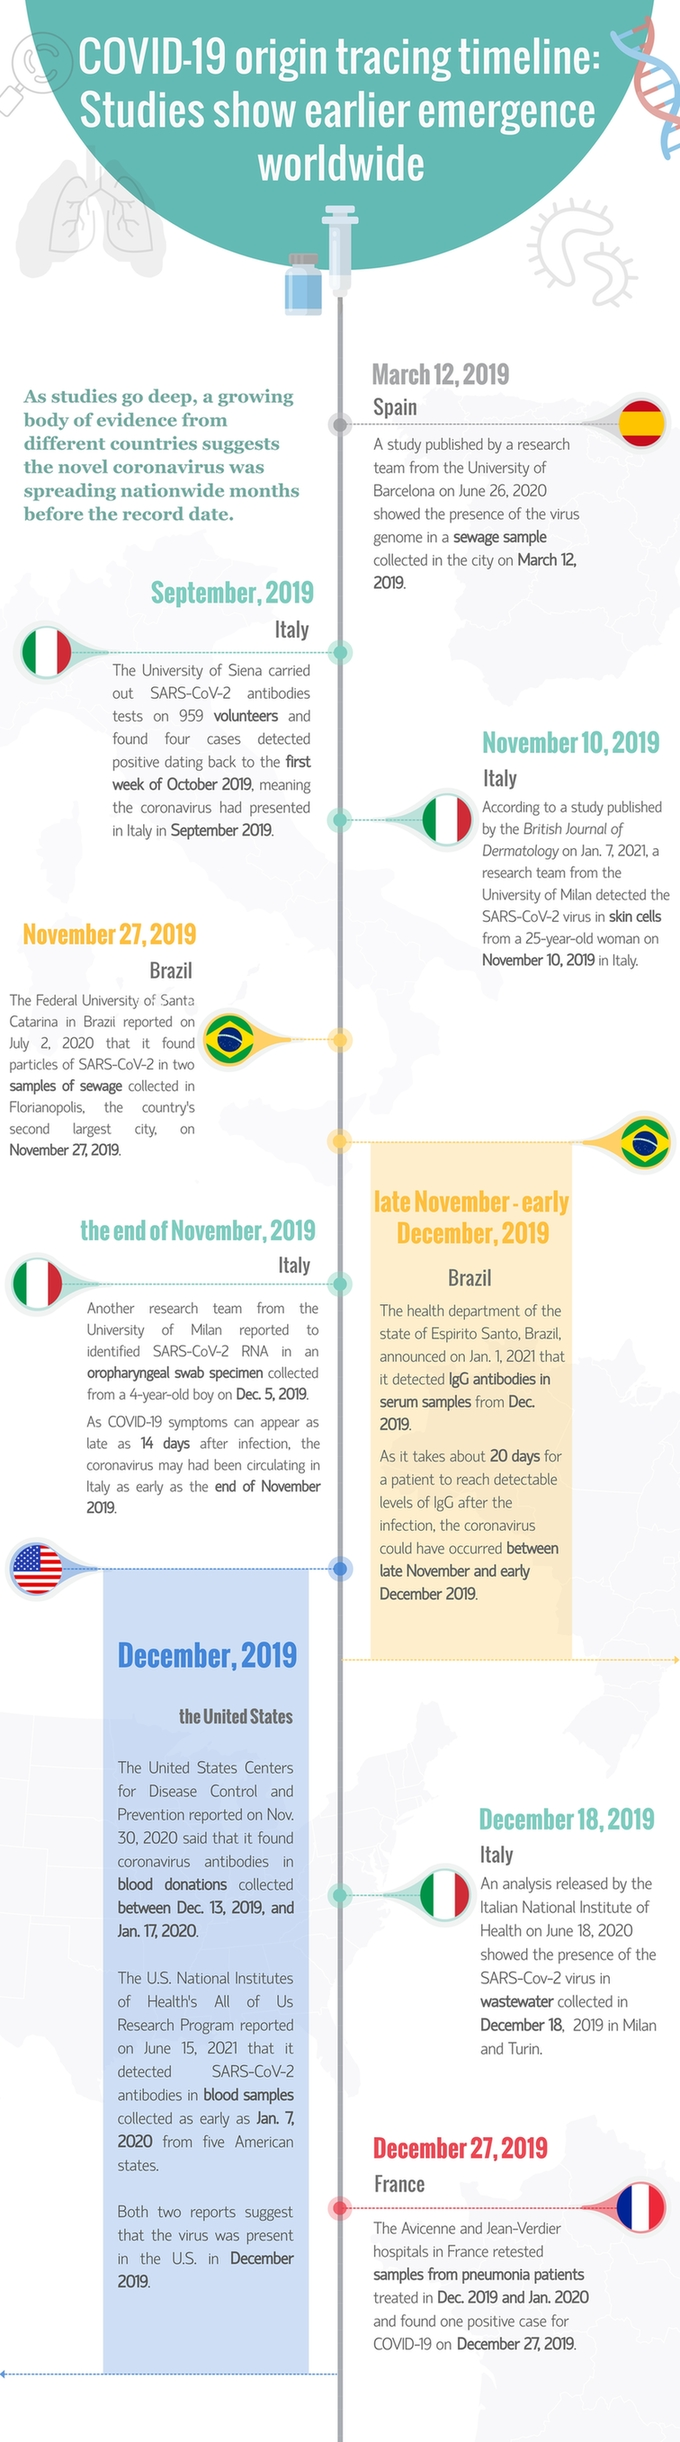 COVID-19 origin tracing timeline: Studies show earlier emergence worldwide